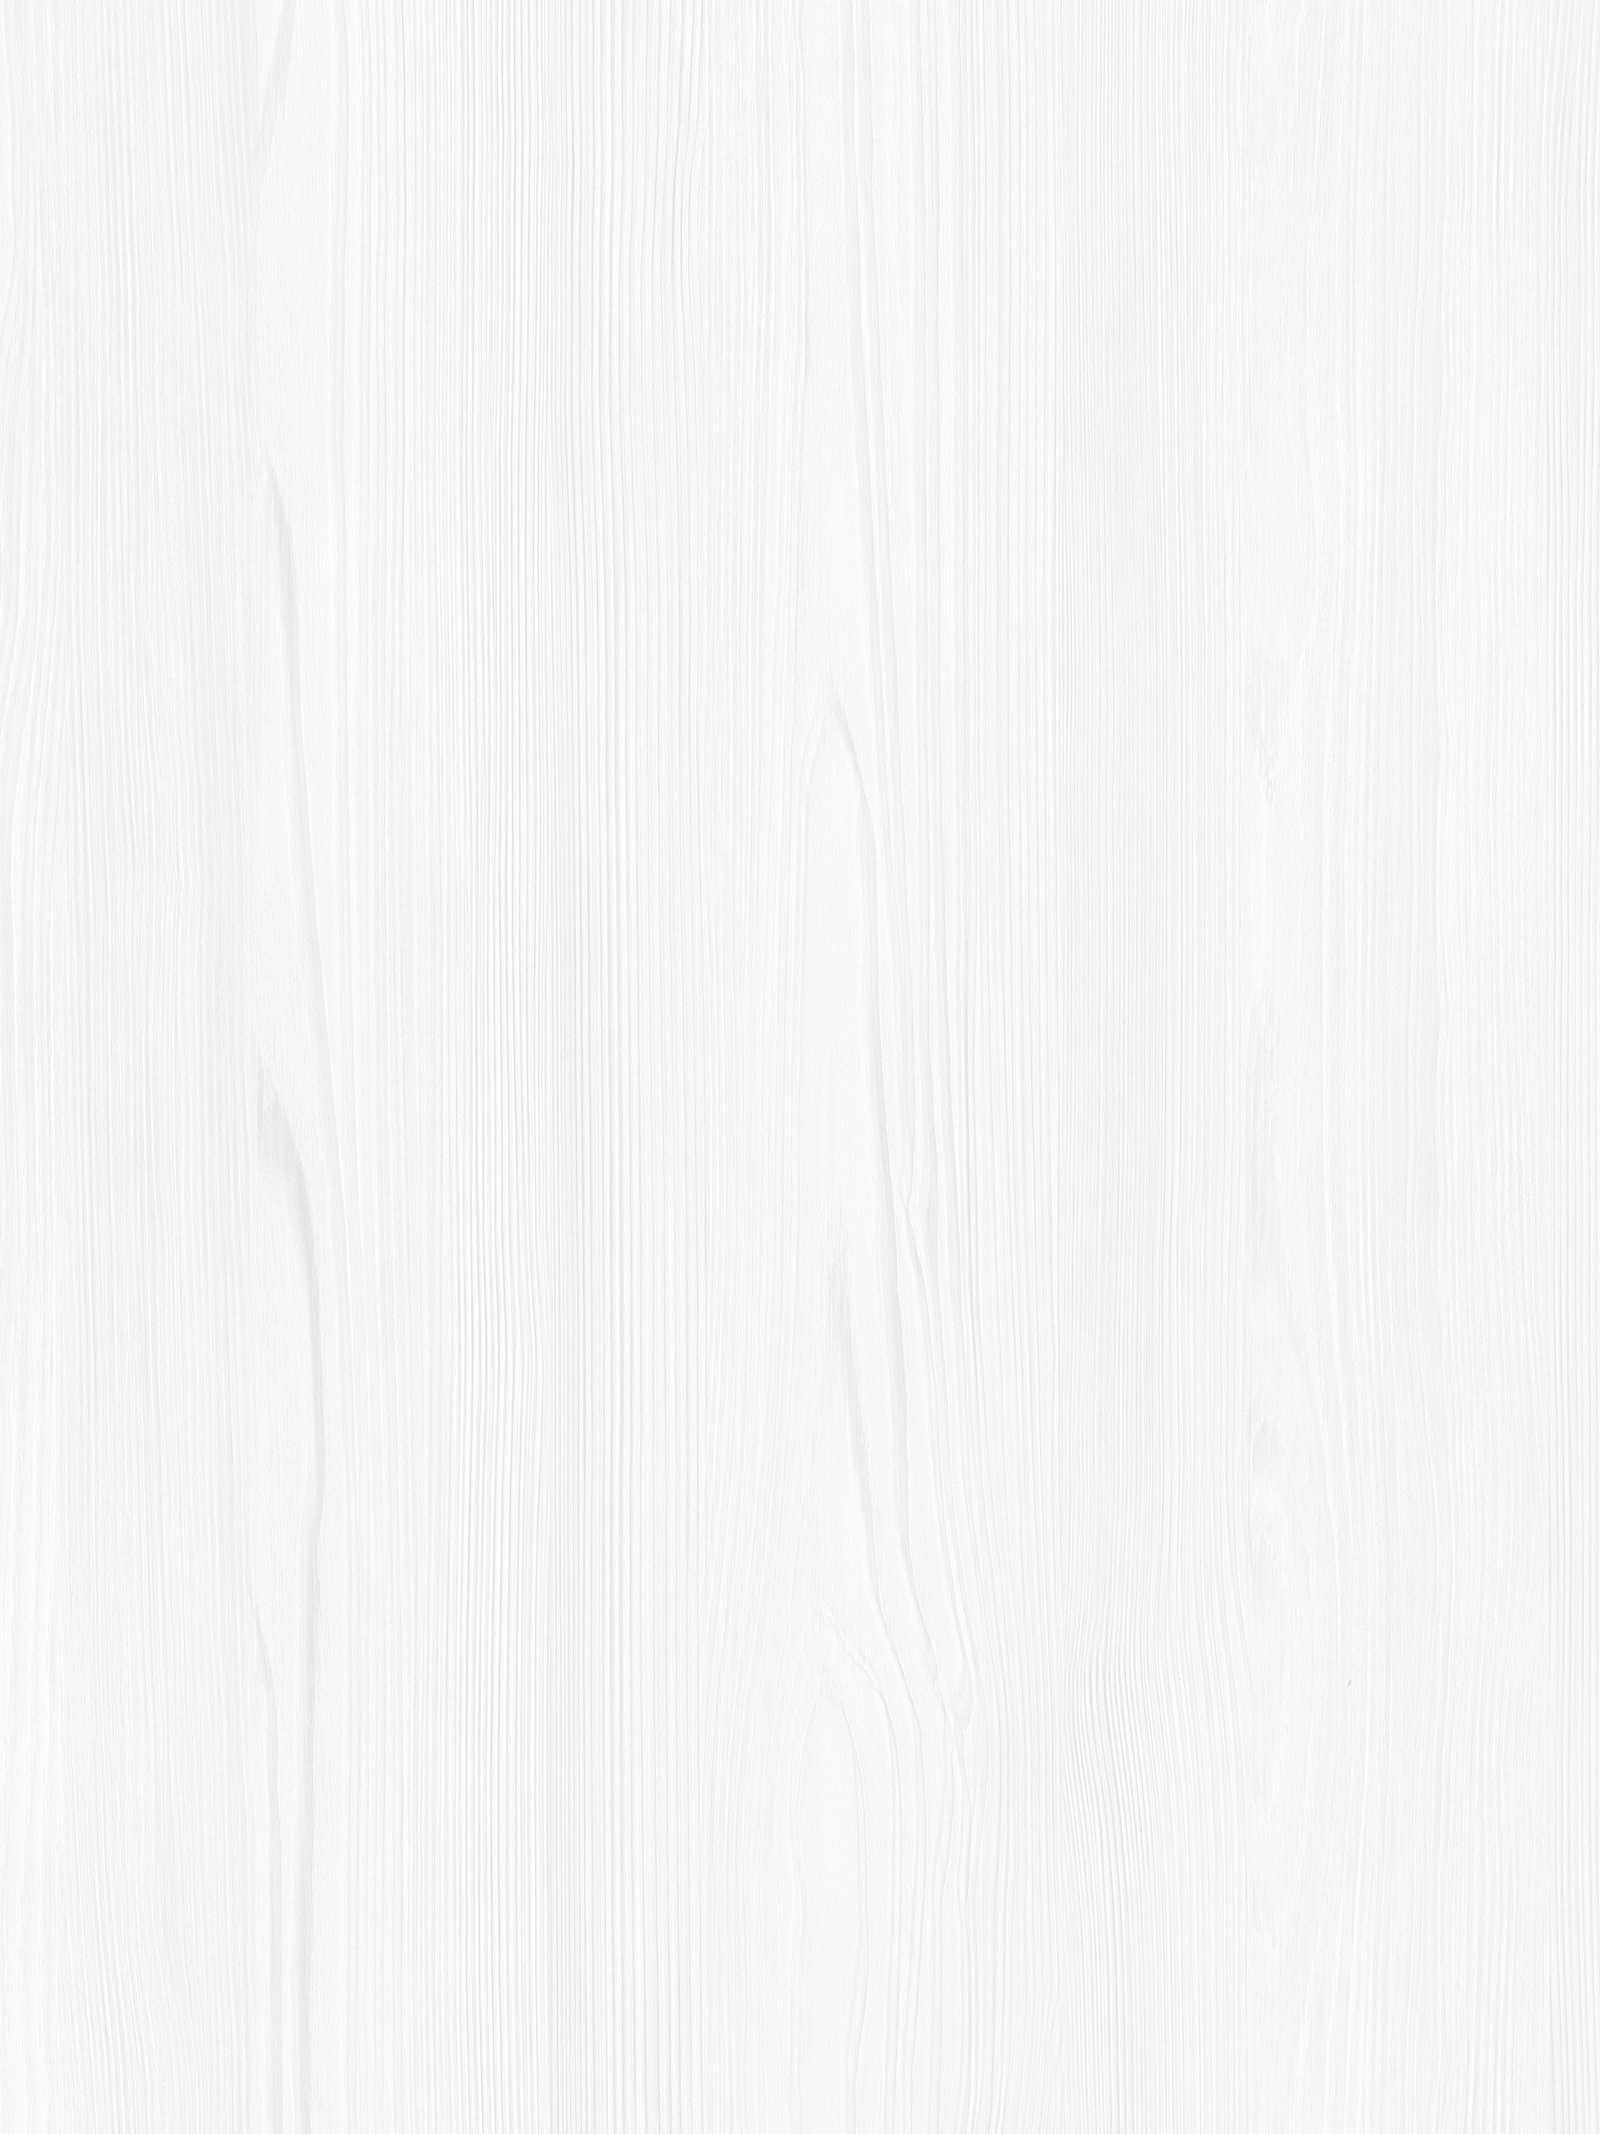 DecoLegno B011 Esperia - detail